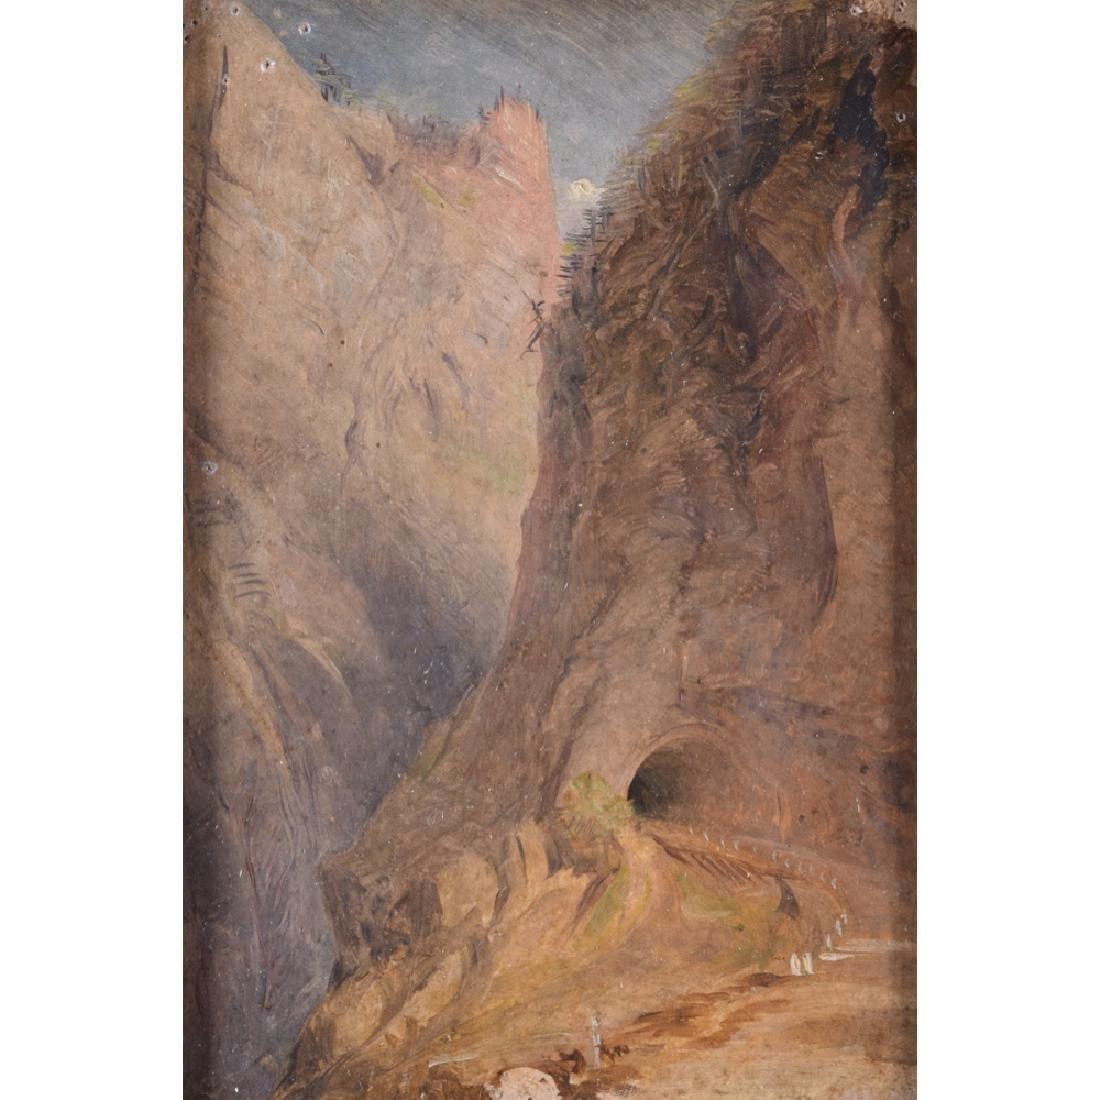 Joseph M W TURNER (1775-1851) - Tunnel